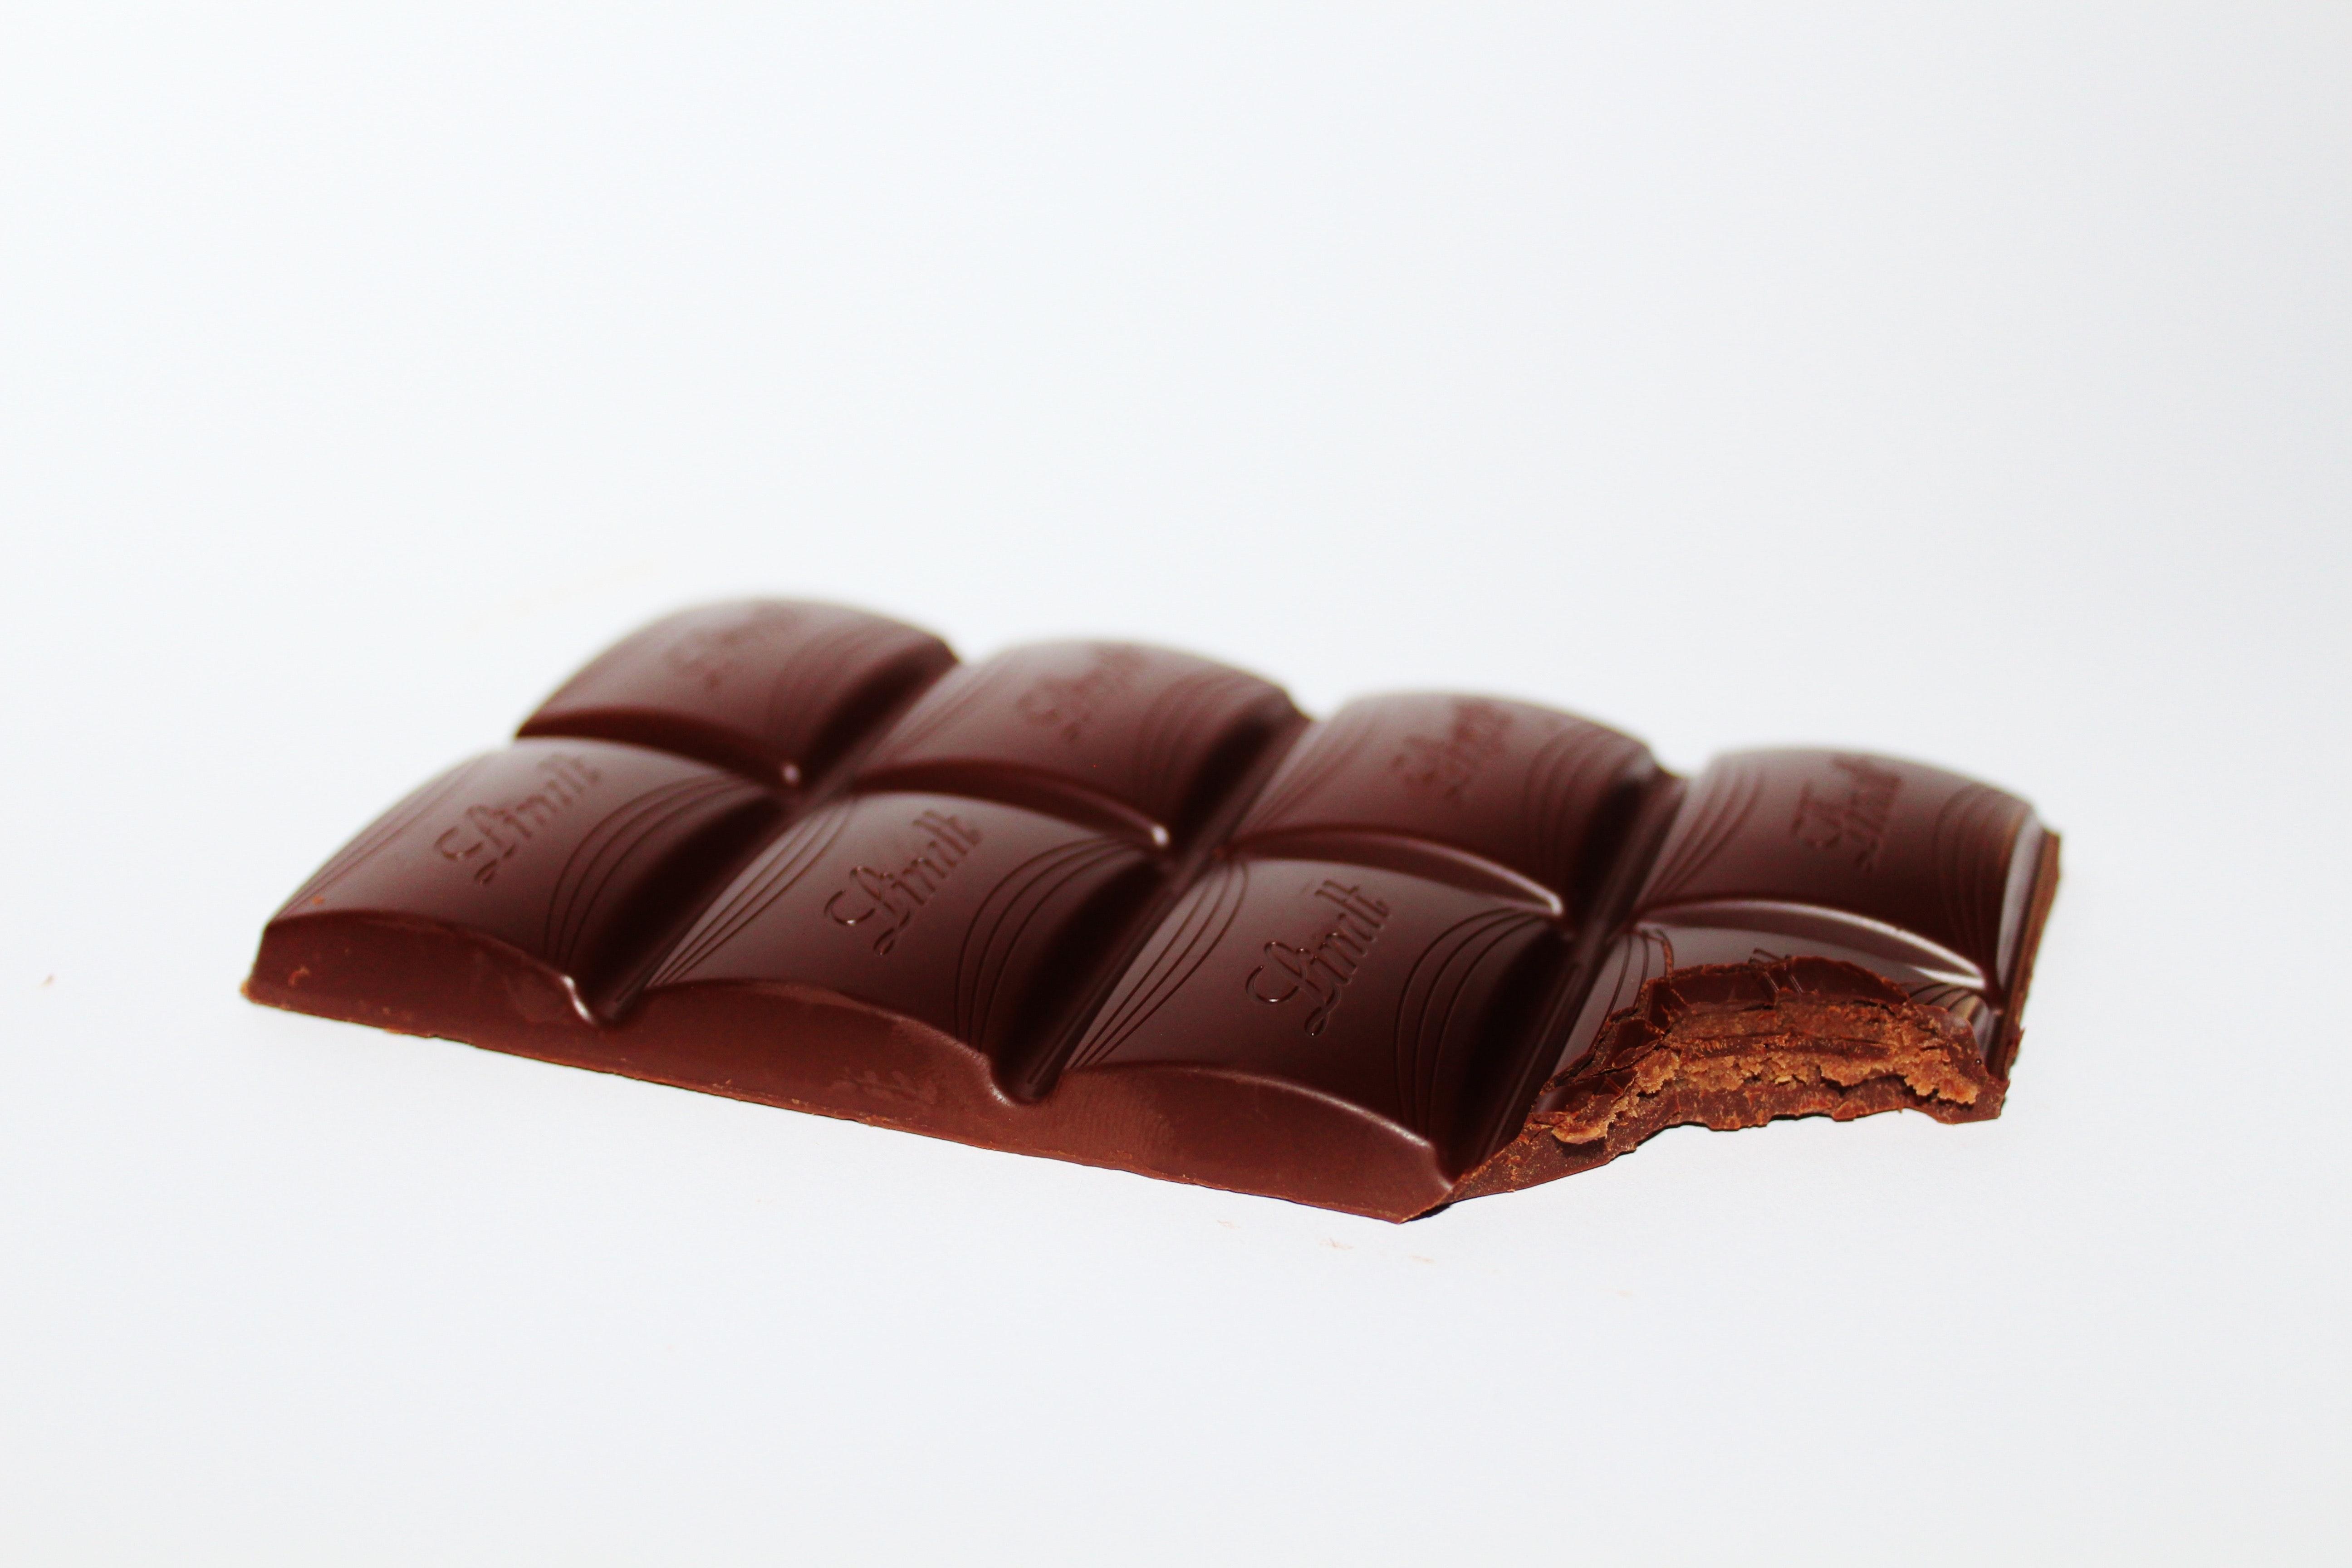 cachorro pode comer chocolate 3